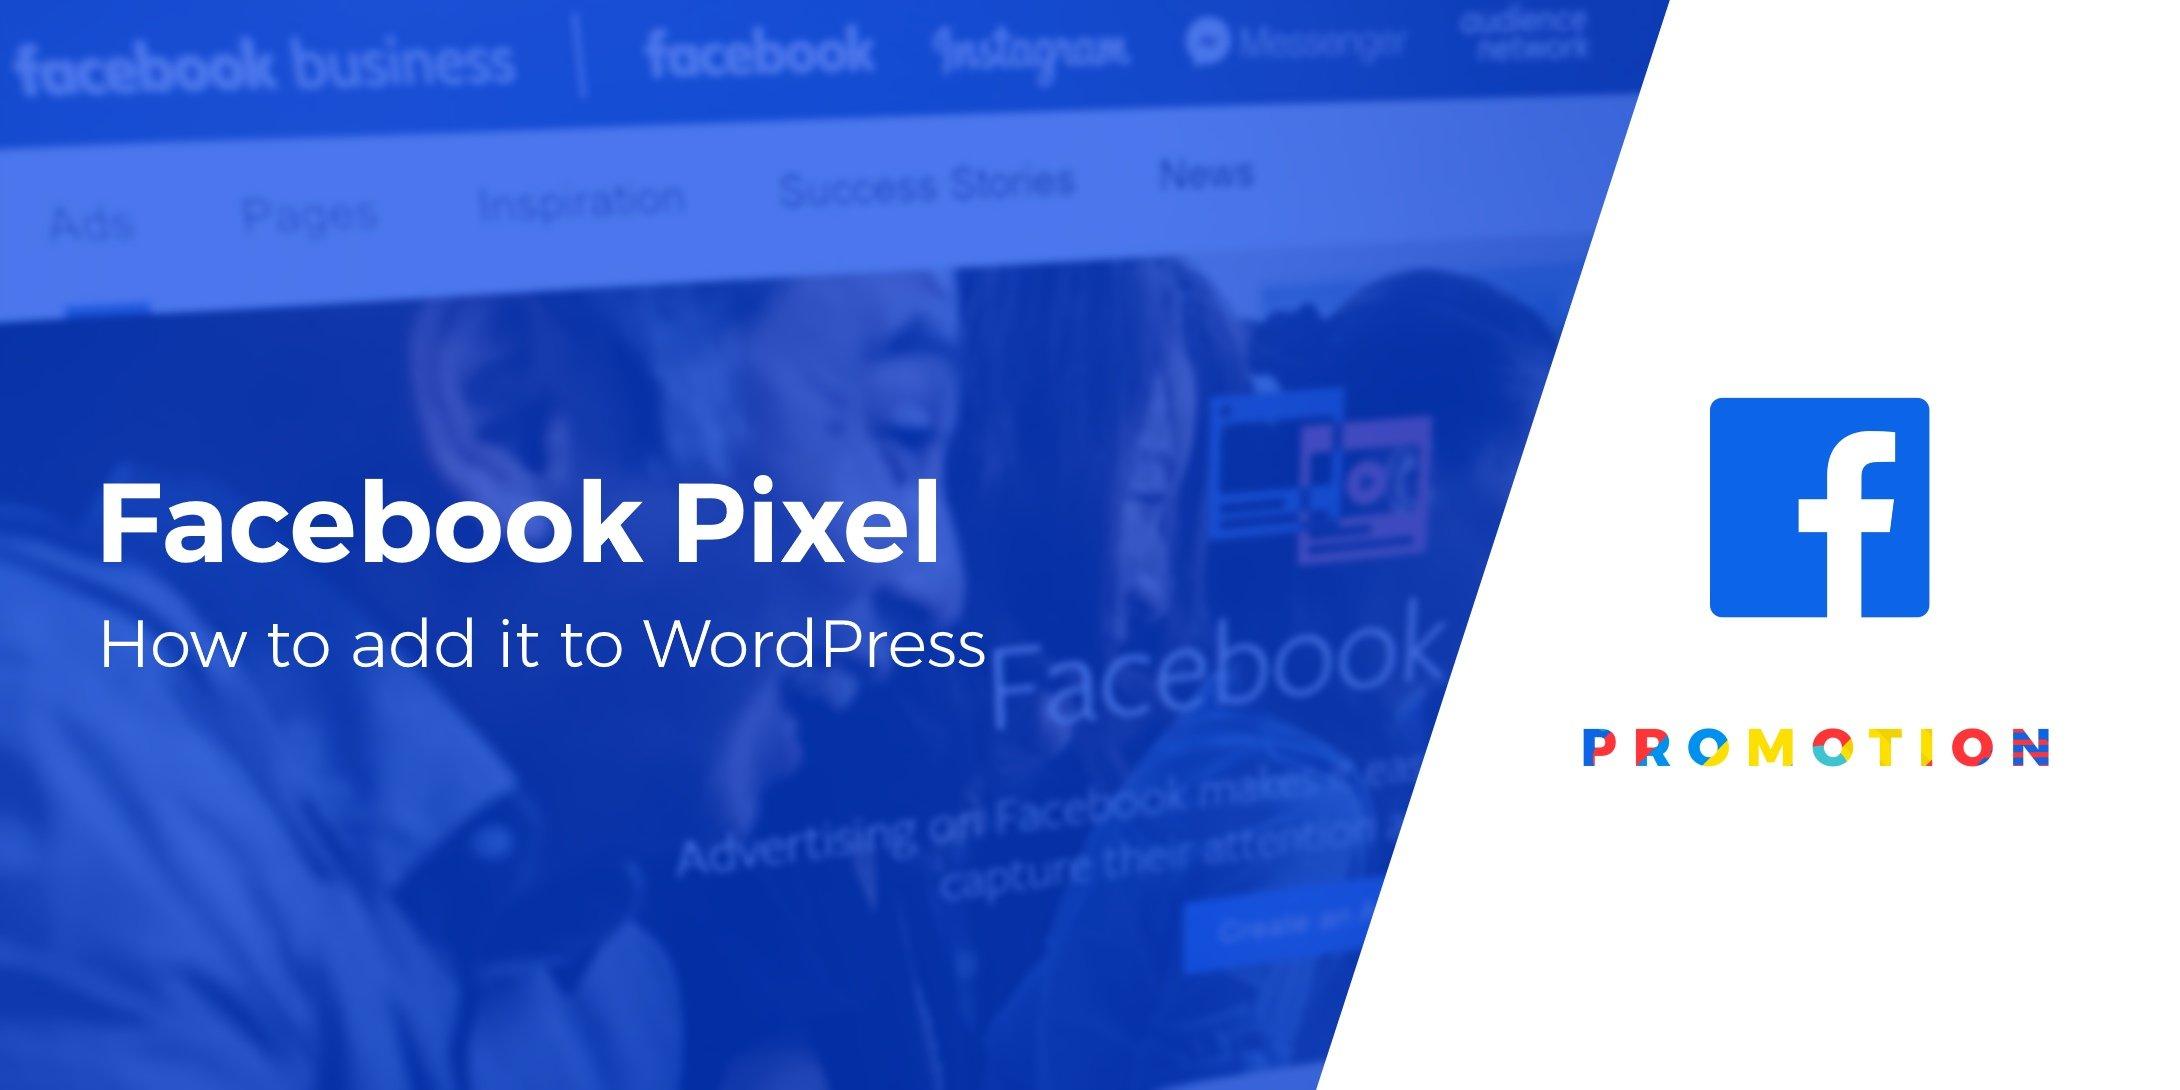 2 Easy Ways to Add Facebook Pixel to WordPress